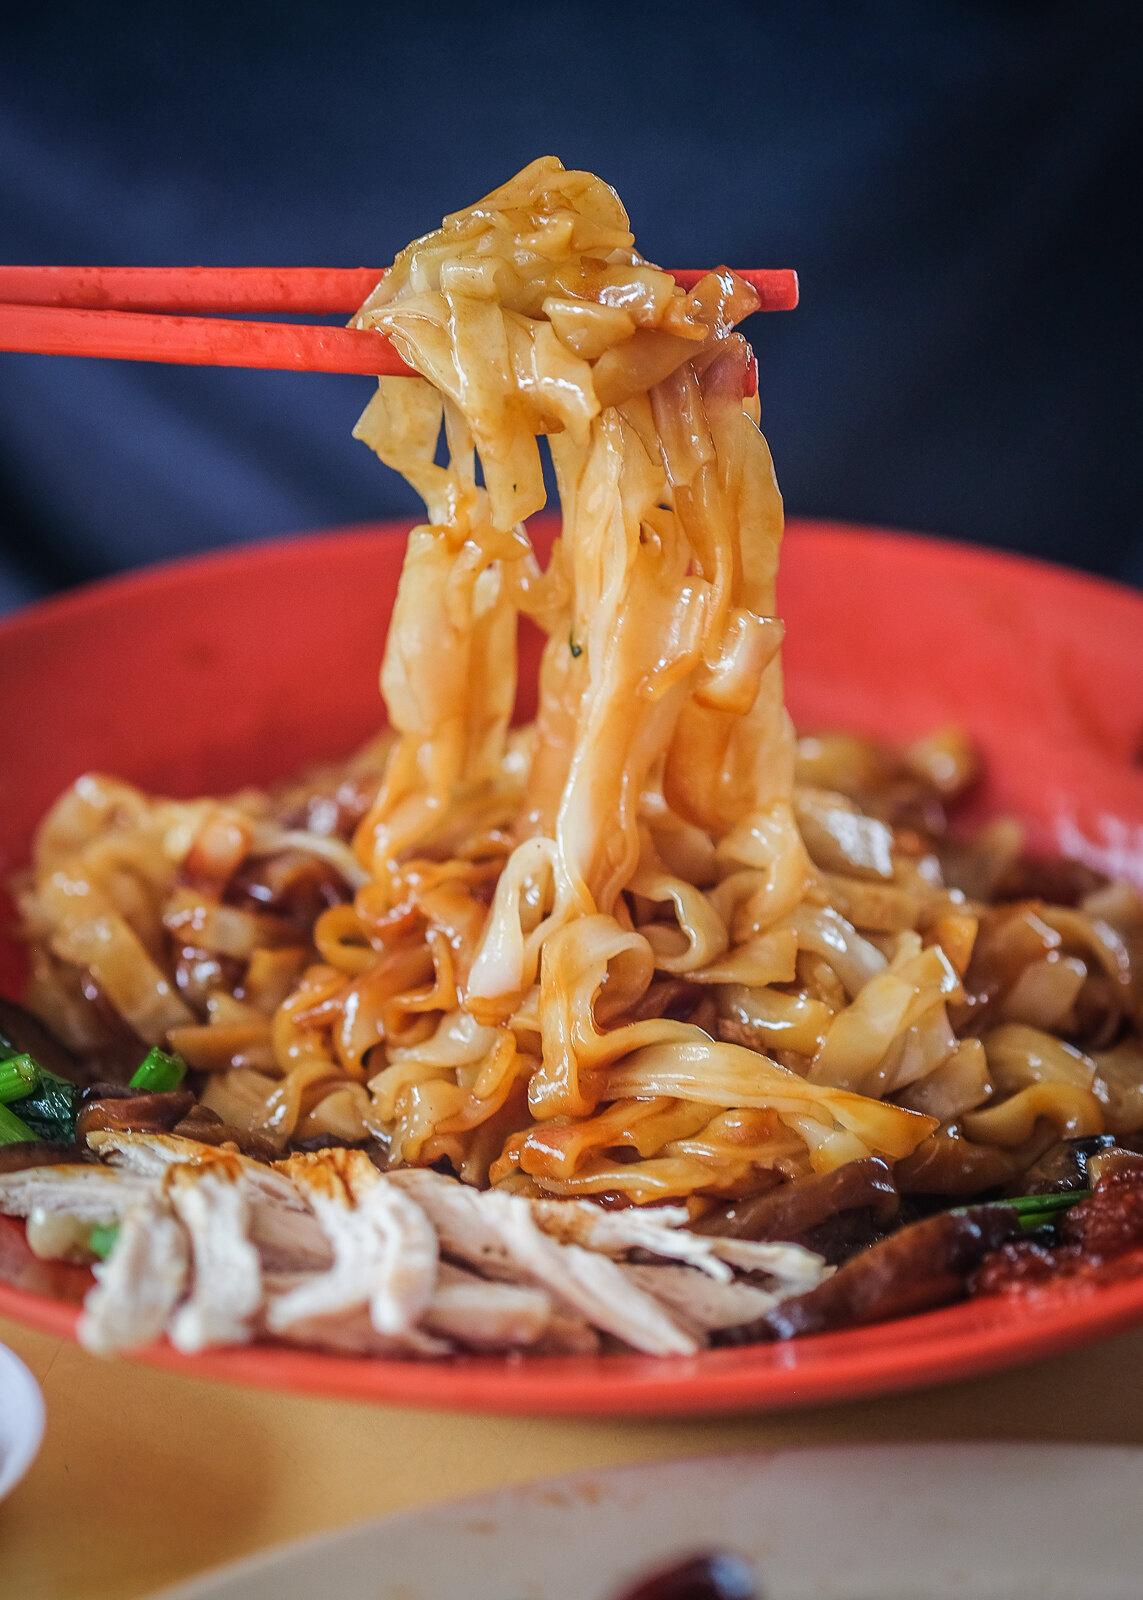 Happy Roast World Shredded Chicken Hor Fun with Chopsticks